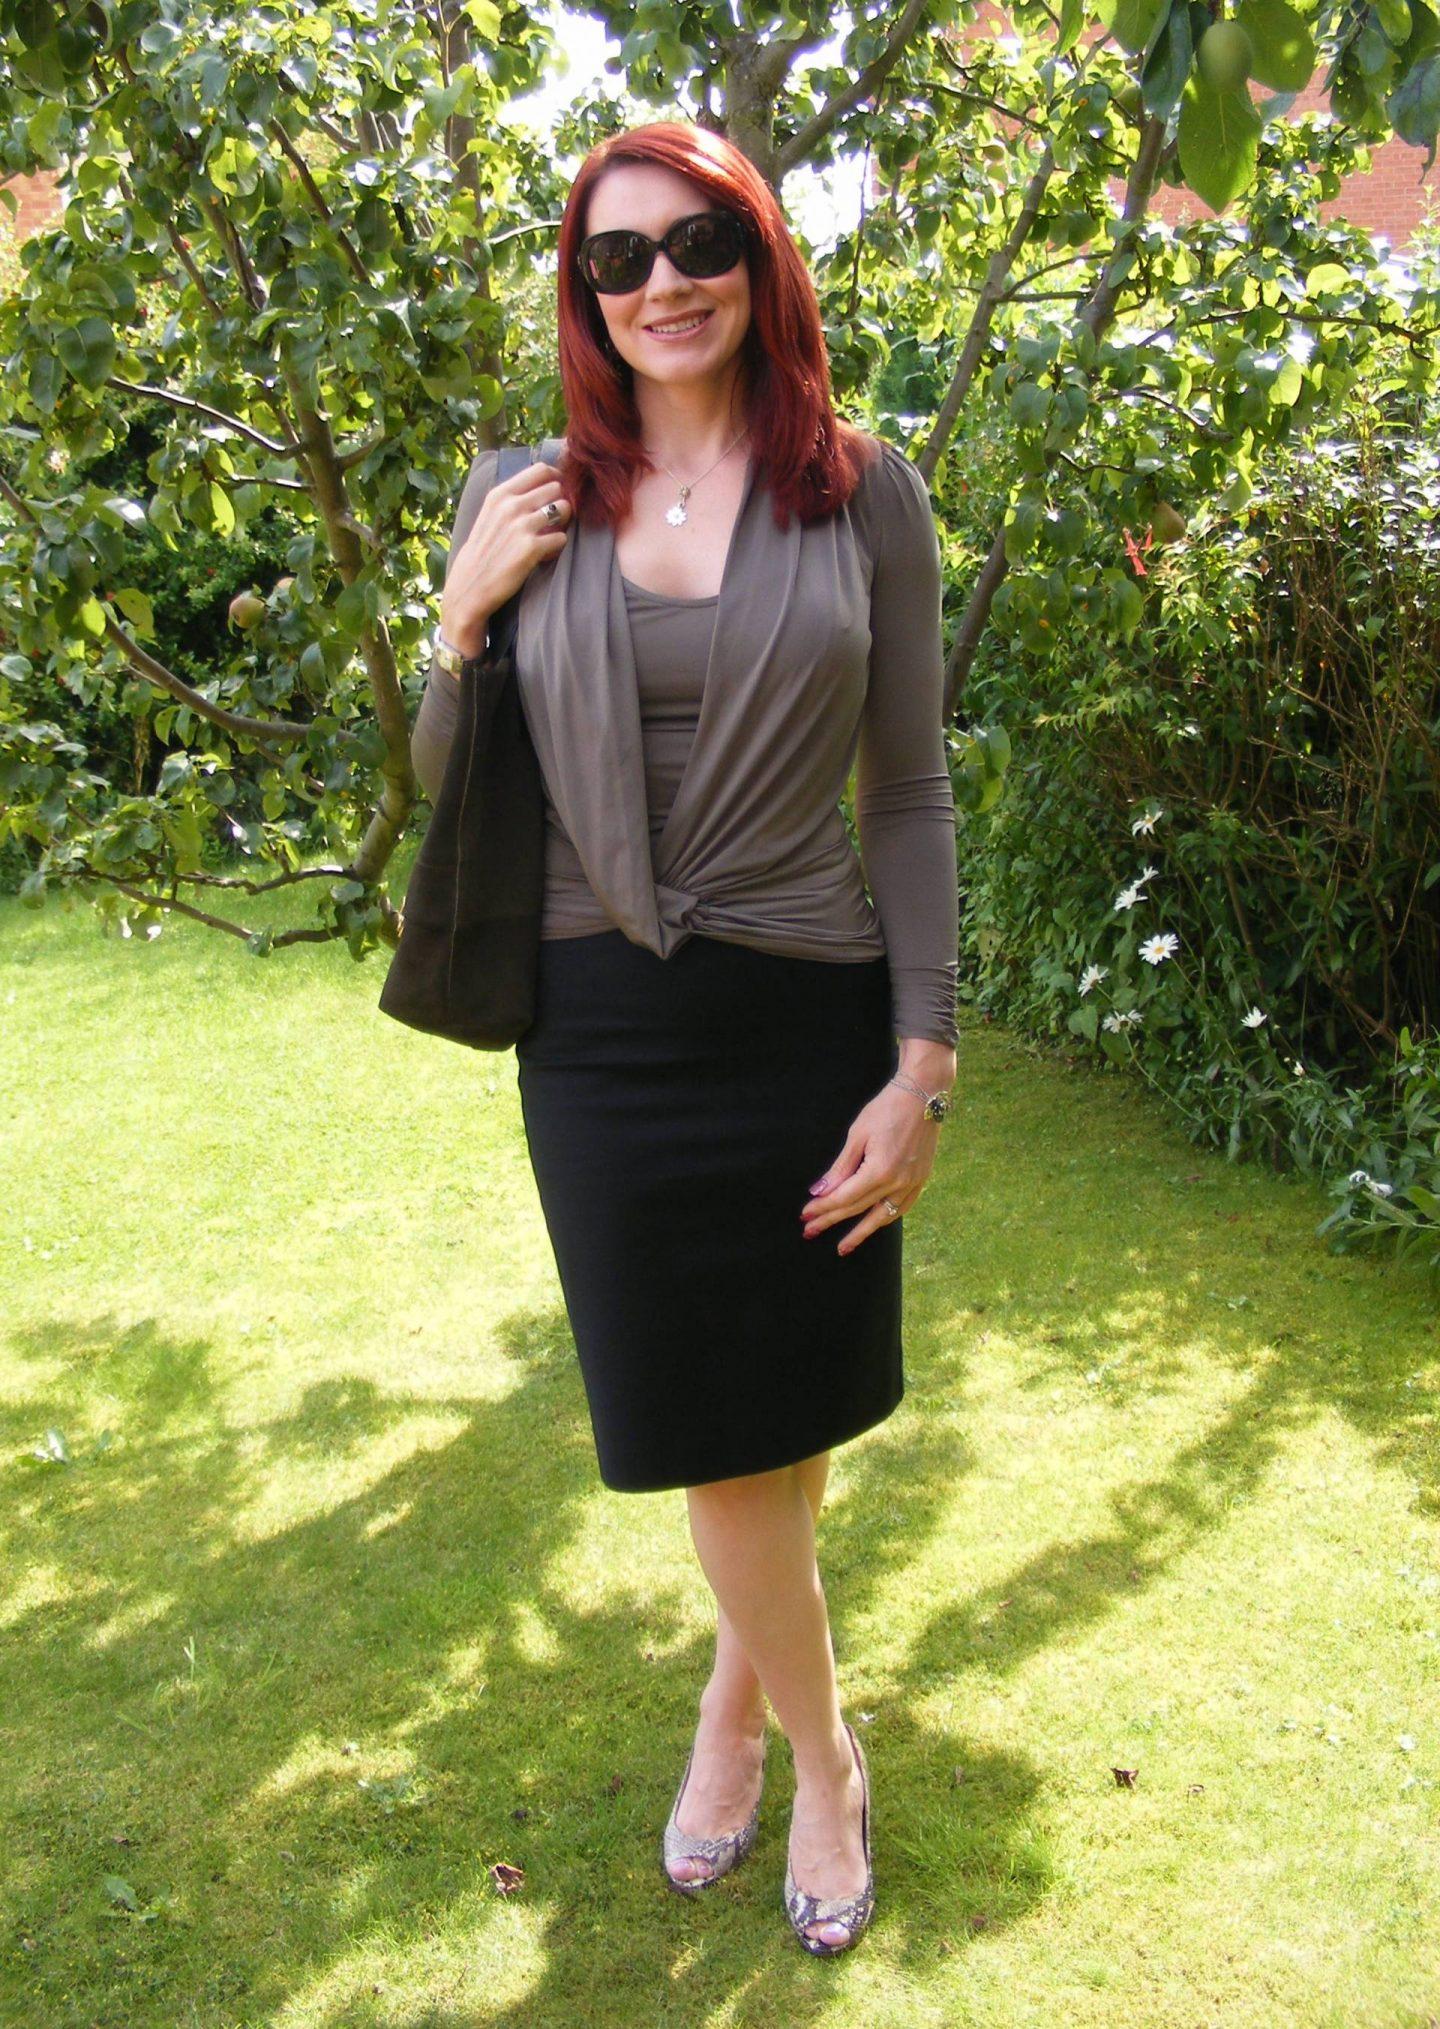 See by Chloe Pencil Skirt and Khaki Draped Top